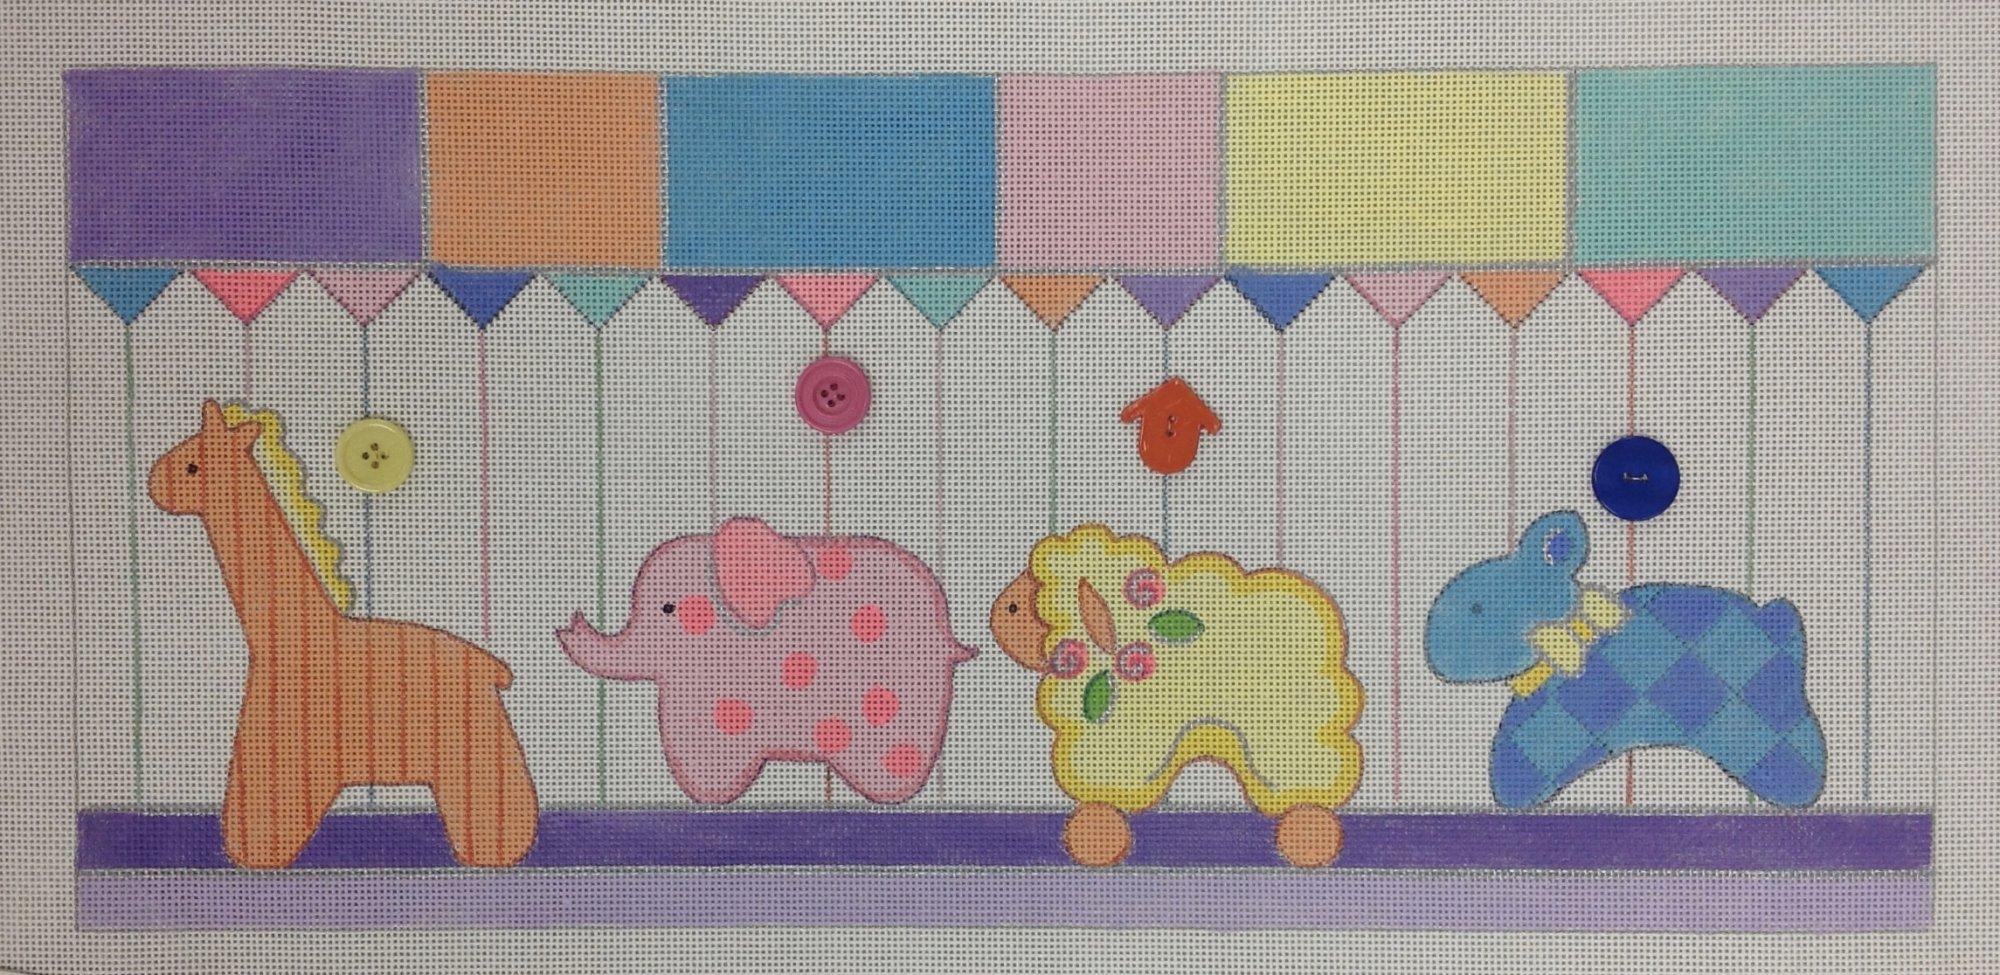 carousel animals*